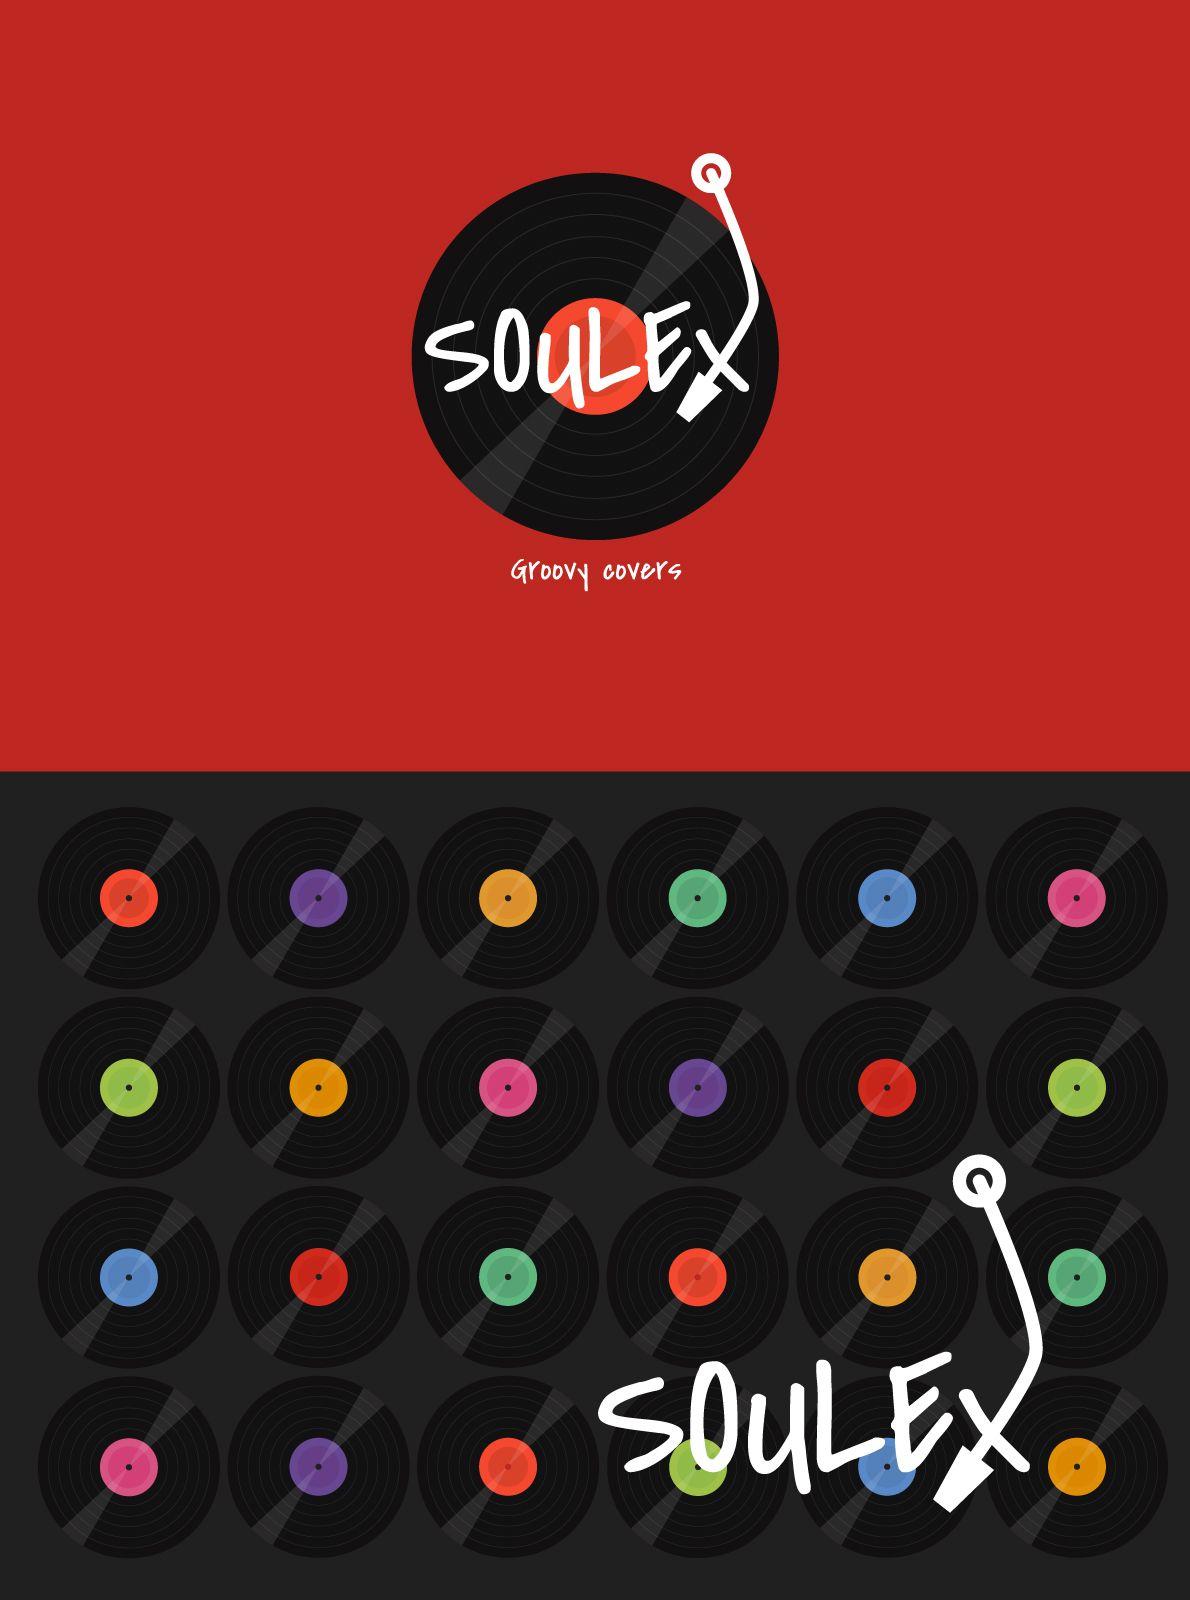 Association Soulex #bordeaux #logo #identity #visual #music